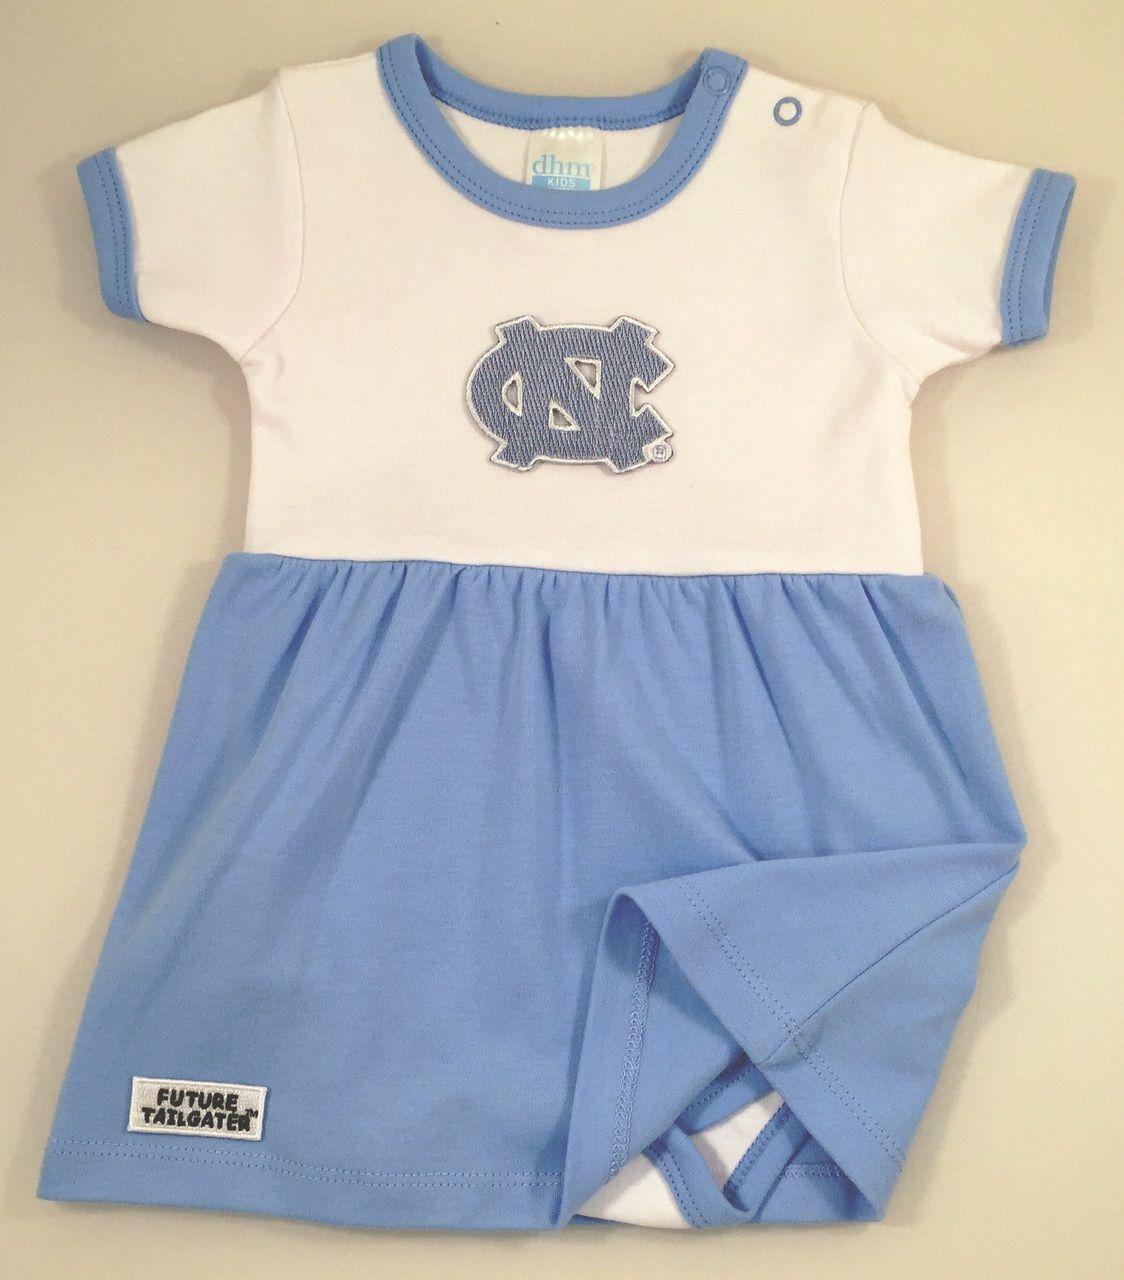 North Carolina Tar Heels Baby Onesie Dress Newborn Unc Tarheels